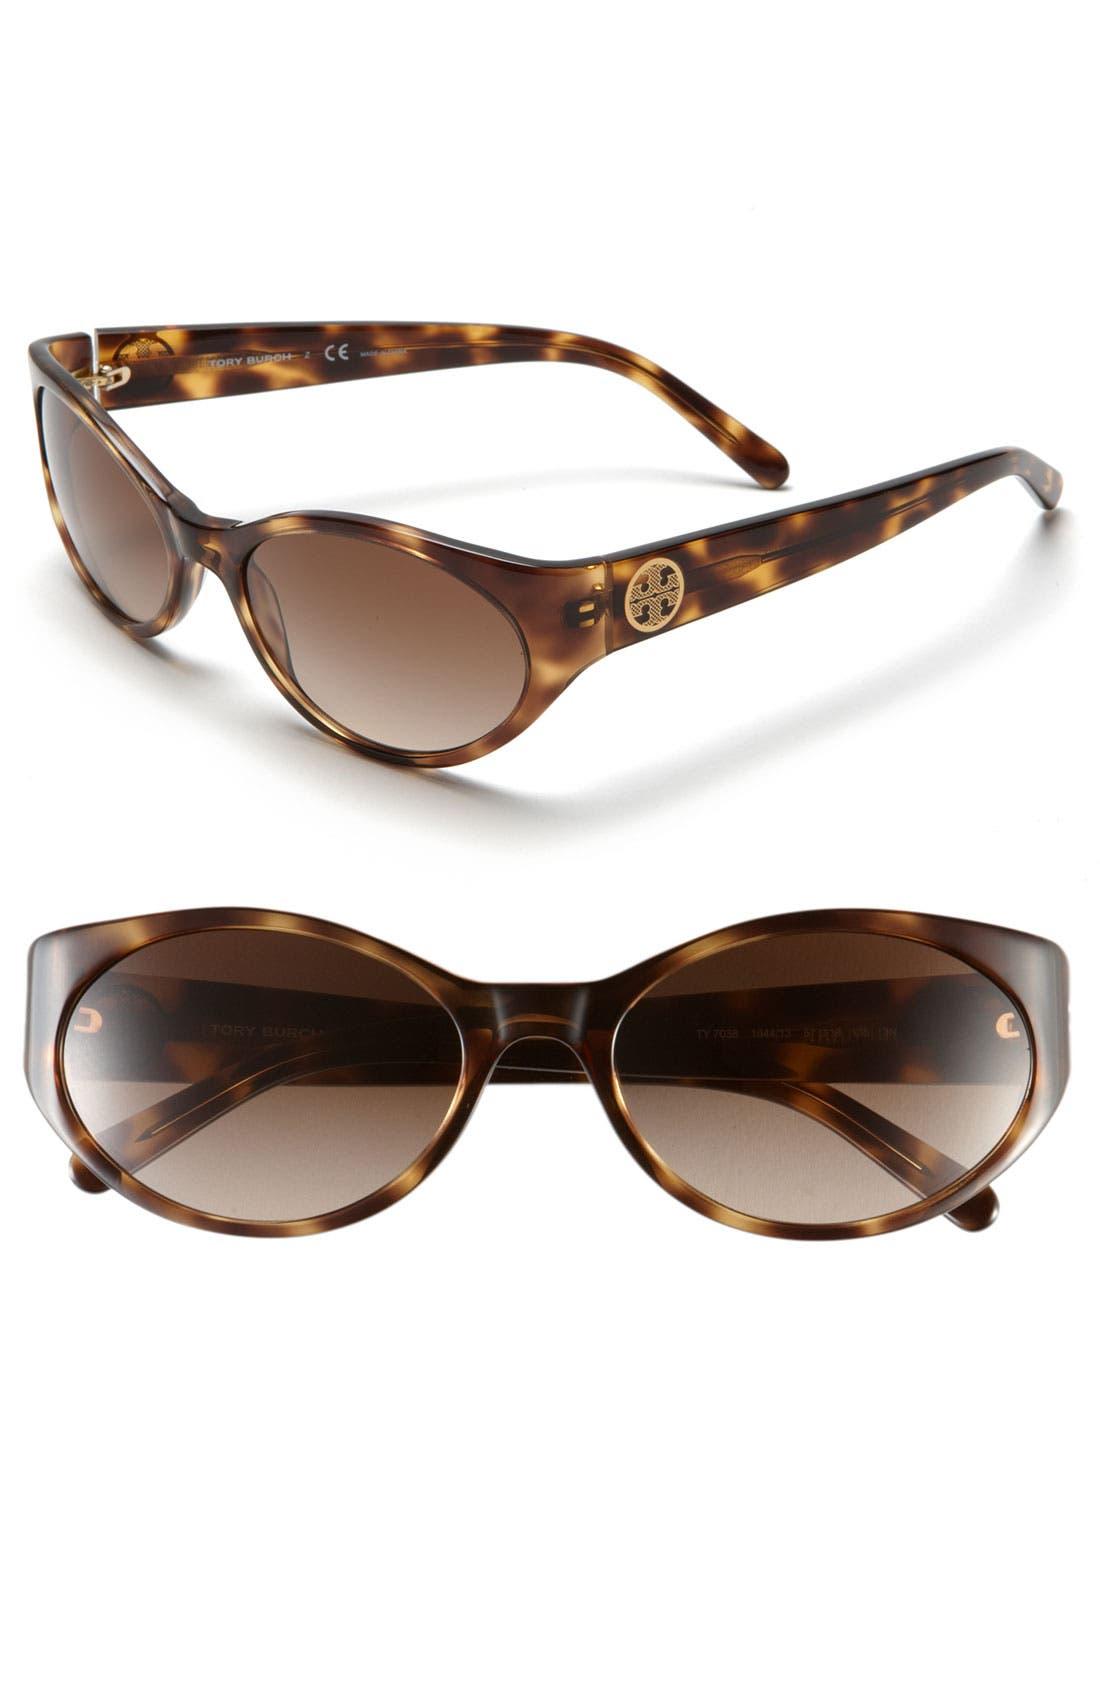 Alternate Image 1 Selected - Tory Burch 57mm Cat Eye Sunglasses